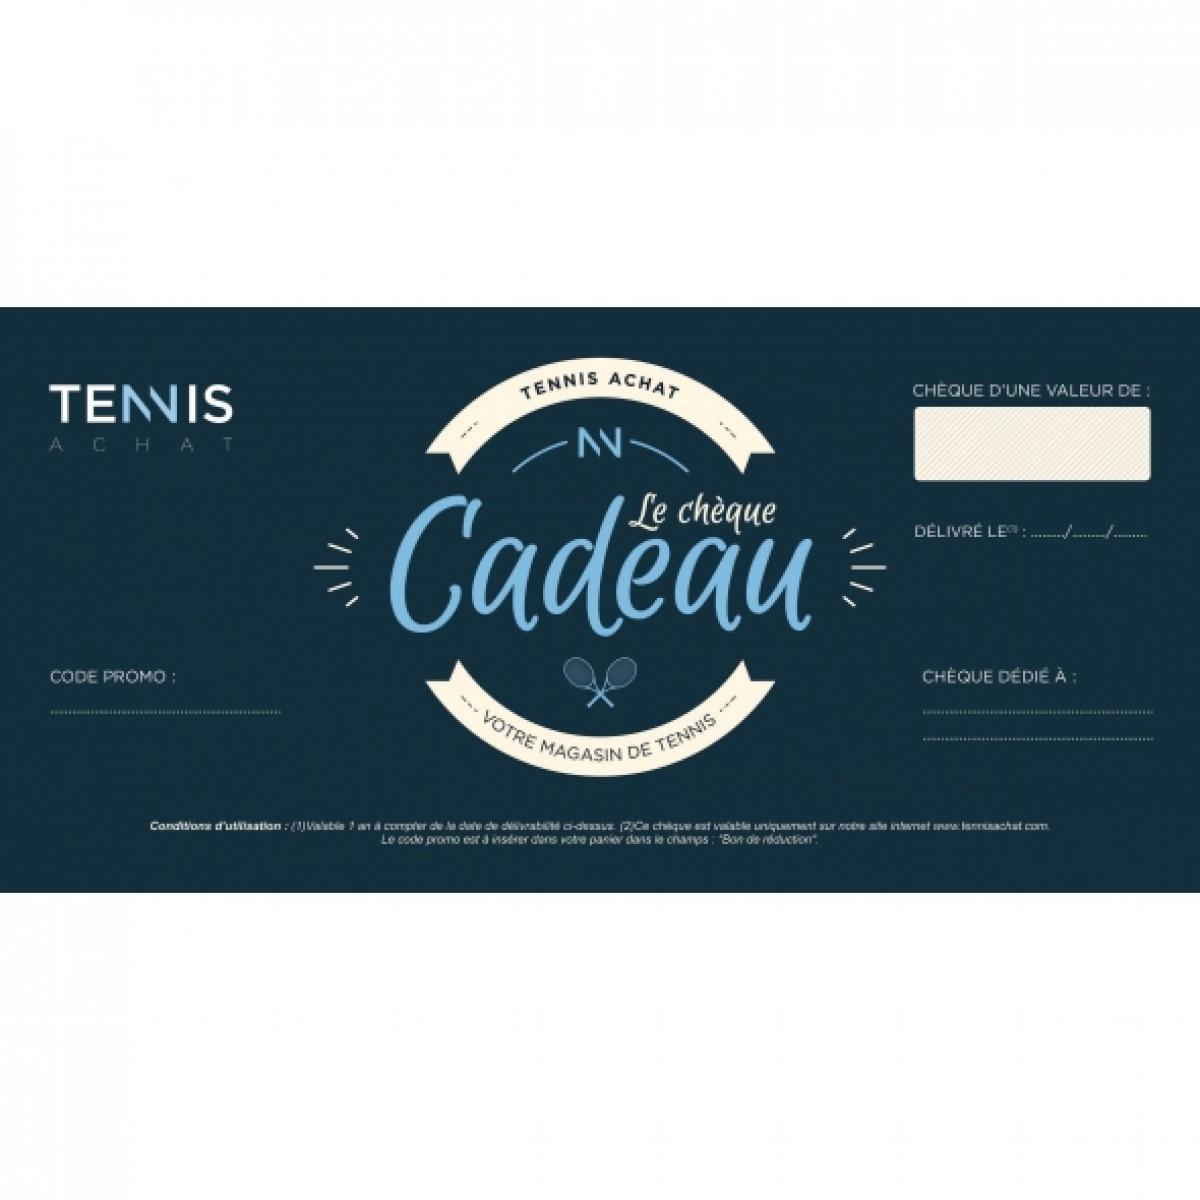 Chèque Cadeau Tennis Achat